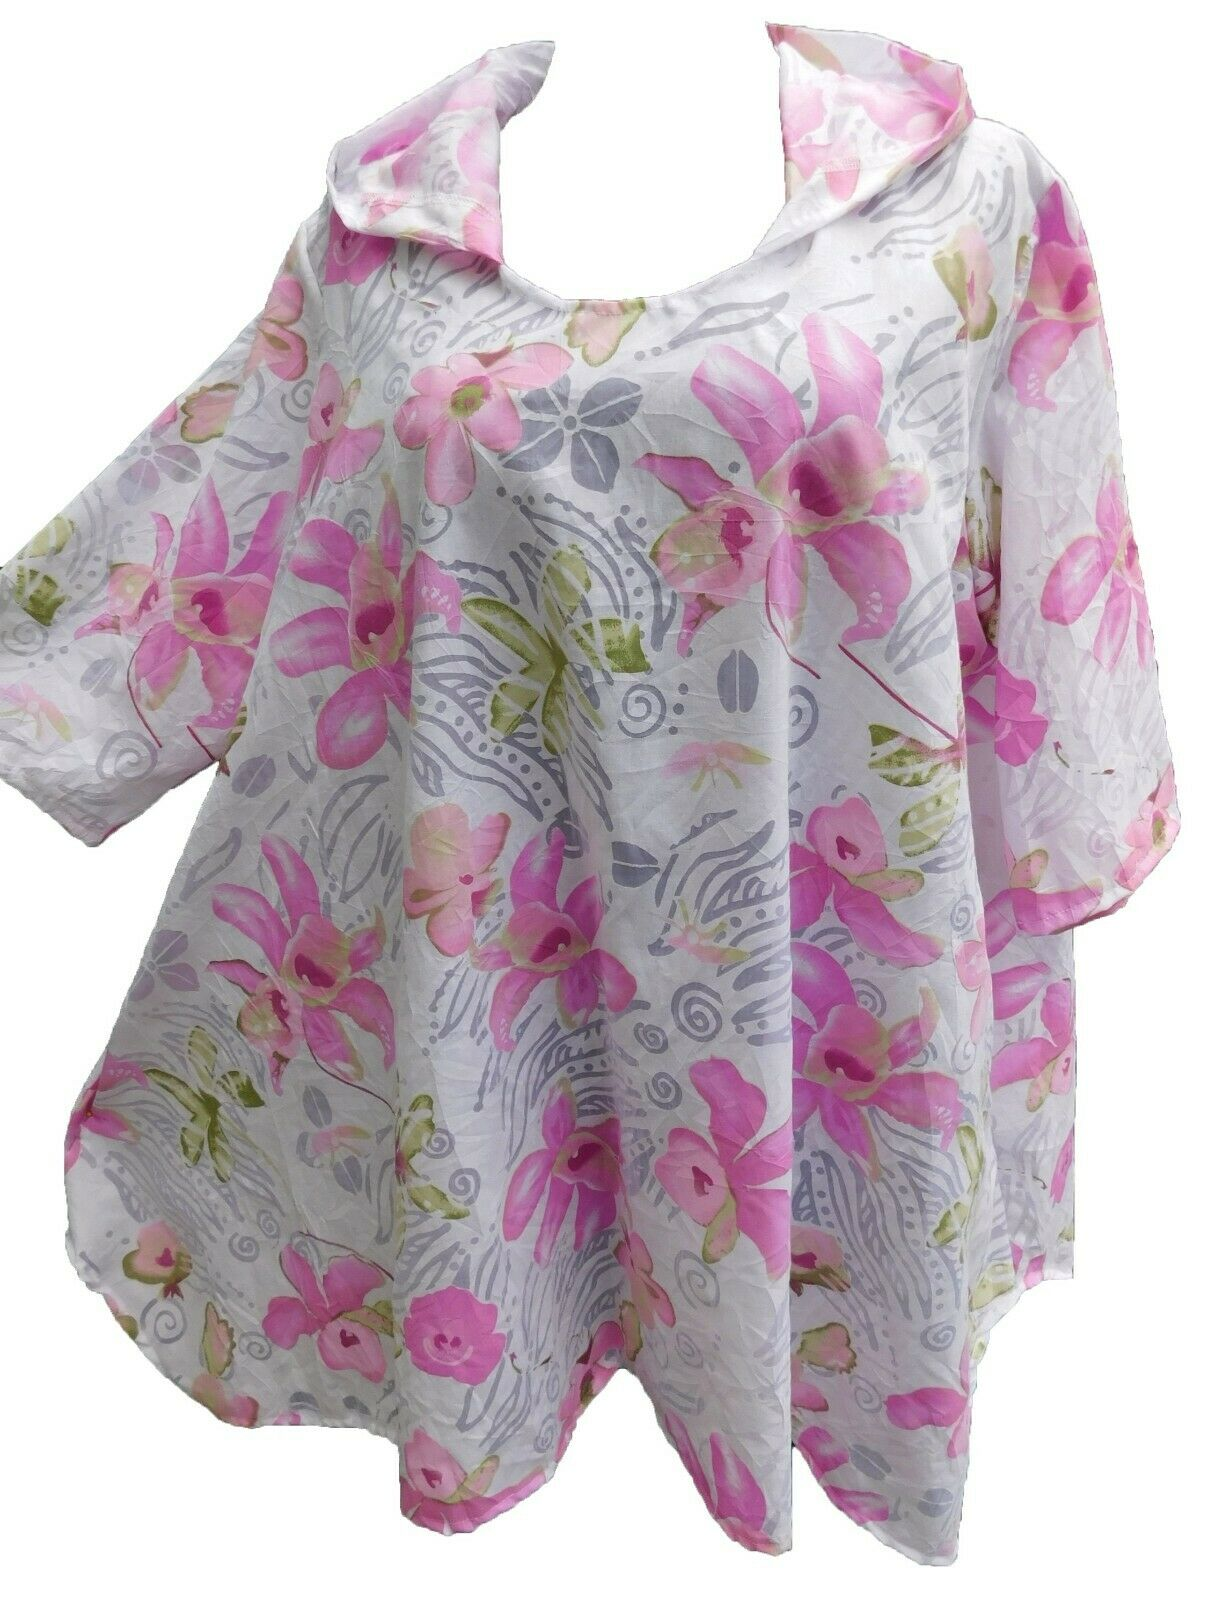 MEXXOO DESIGN bluese Tunika Shirt mit Kapuze Viskose pink white geblümt Gr. 52-54